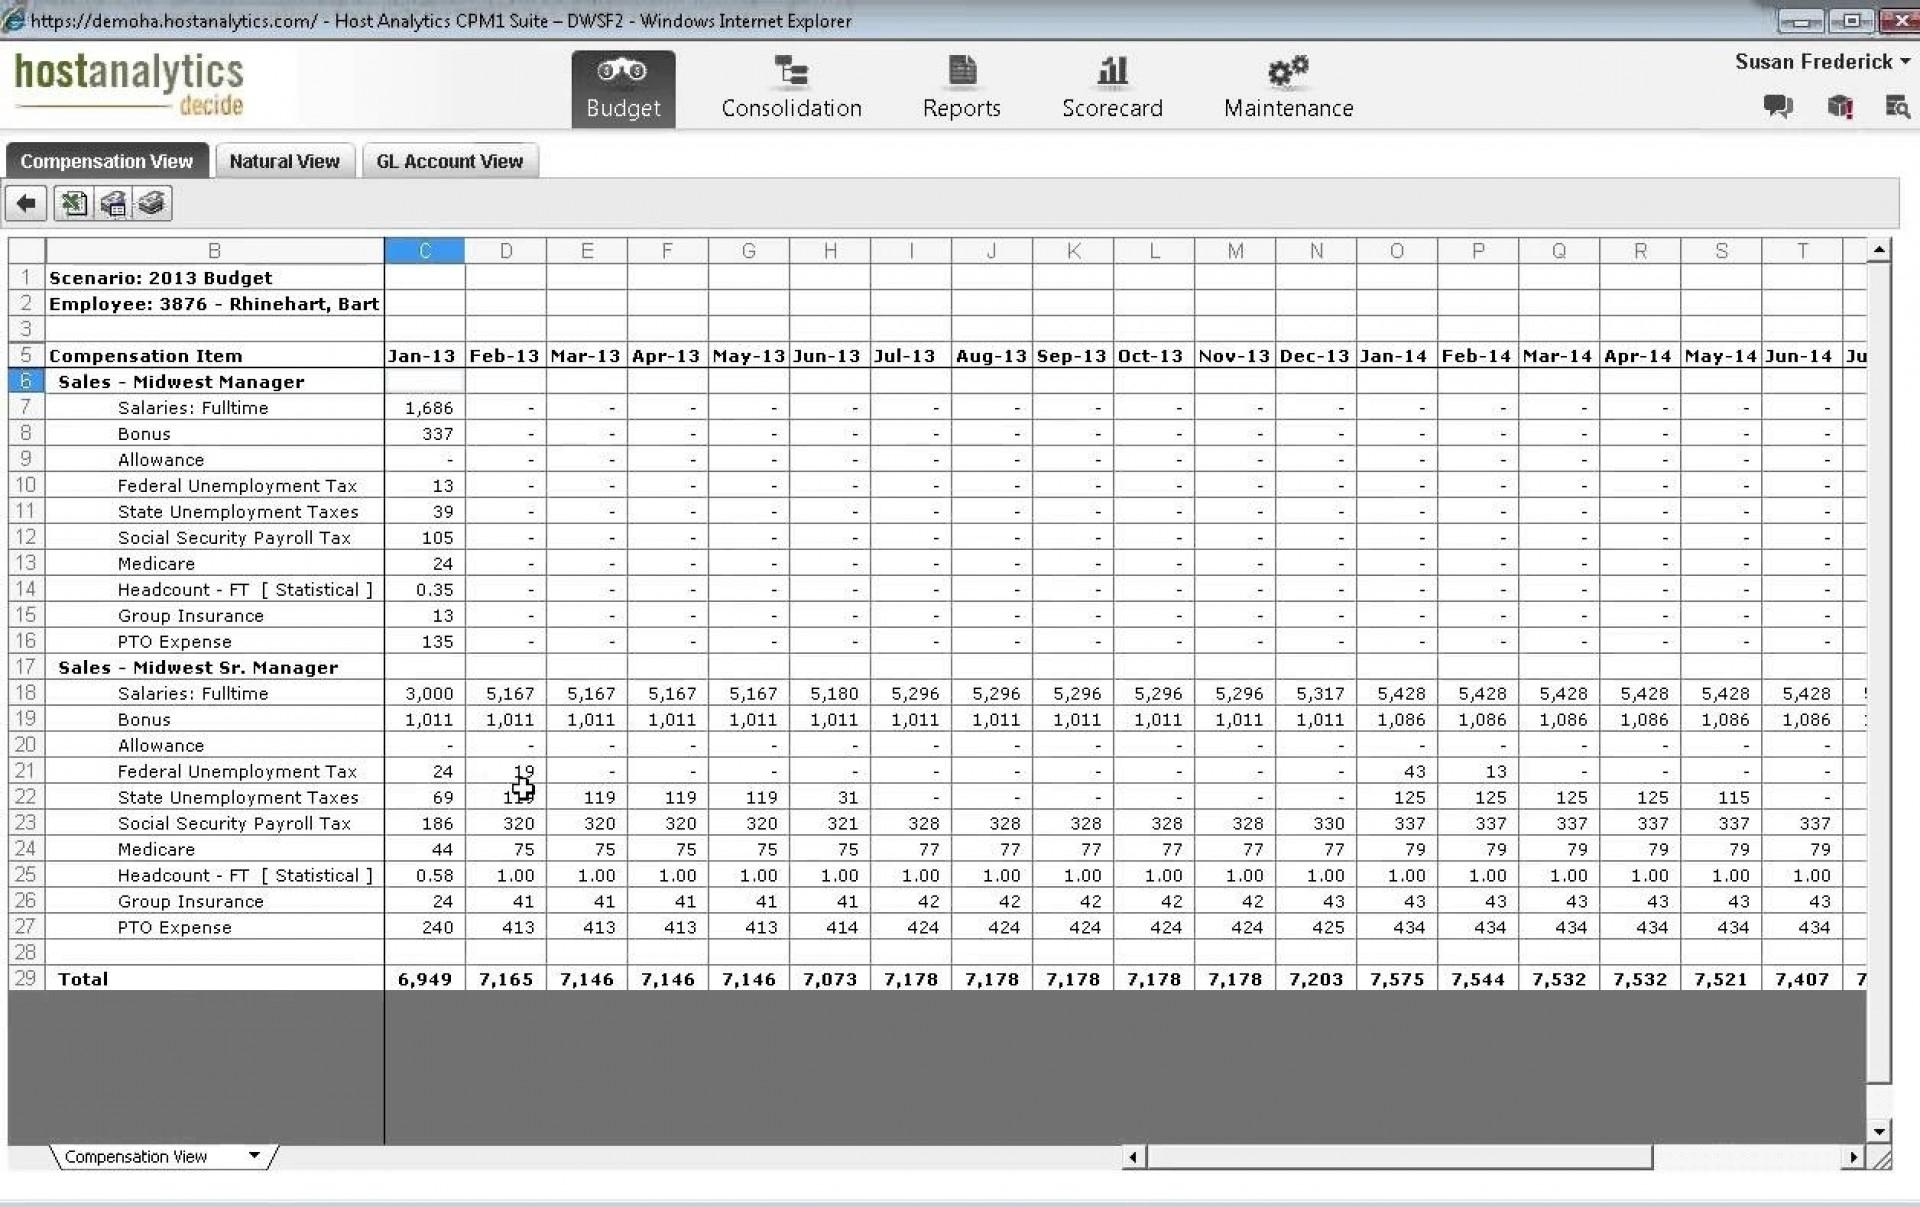 Workforce Planning Spreadsheet Template Pertaining To 005 Workforcening Template Xls Management Excel Spreadsheet